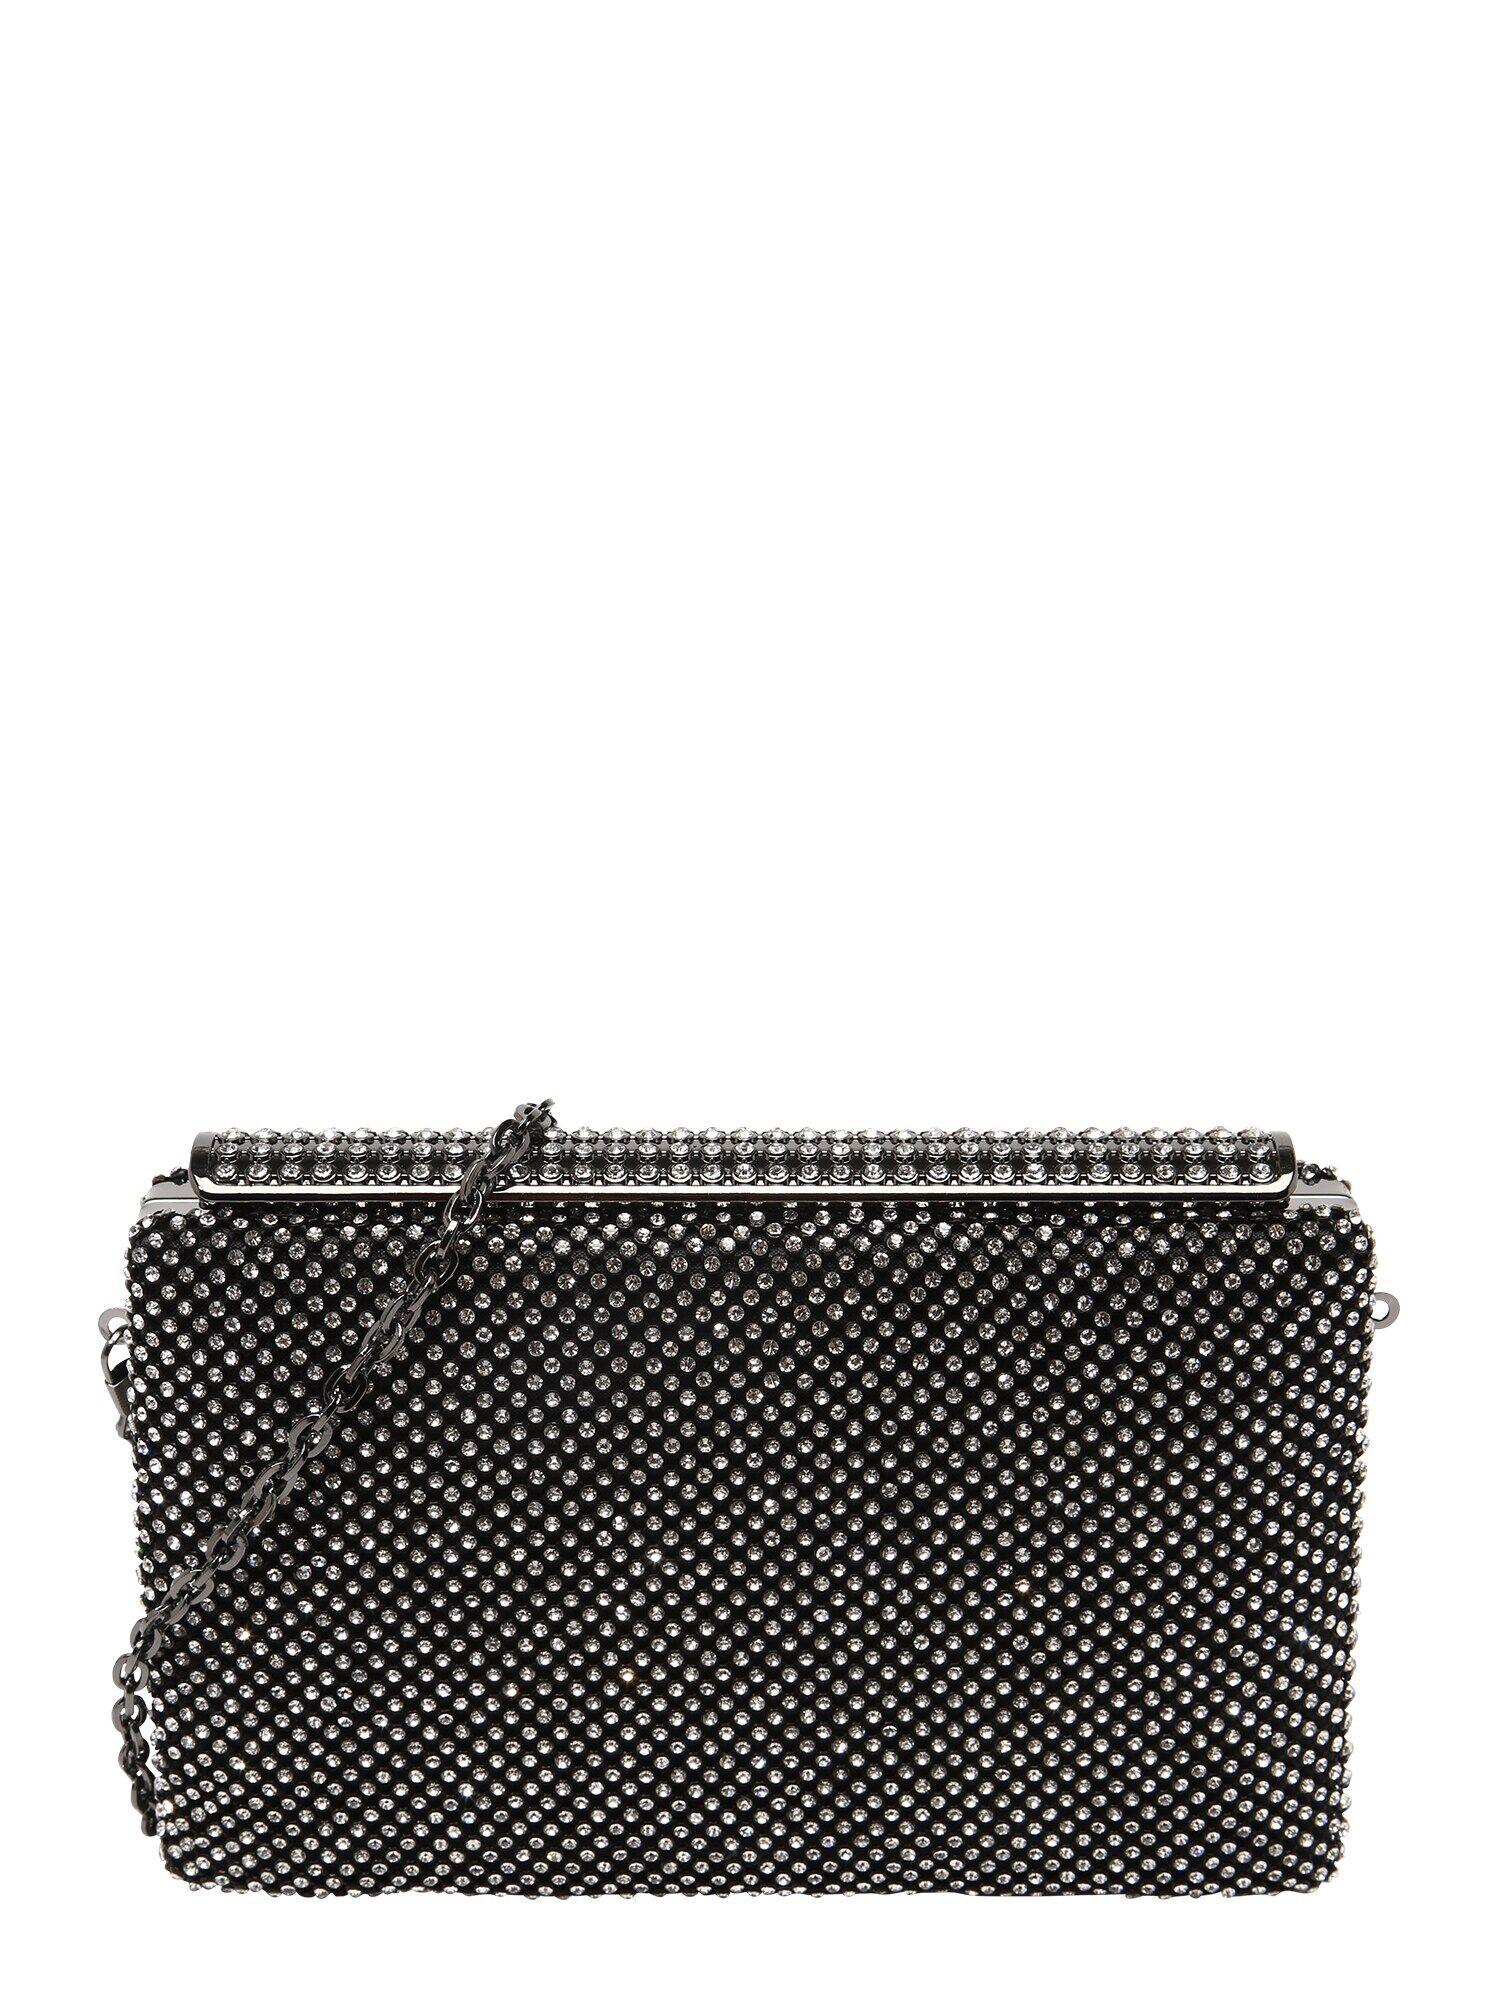 mascara Sac à bandoulière 'BOX DIAMOND'  - Noir - Taille: One Size - female